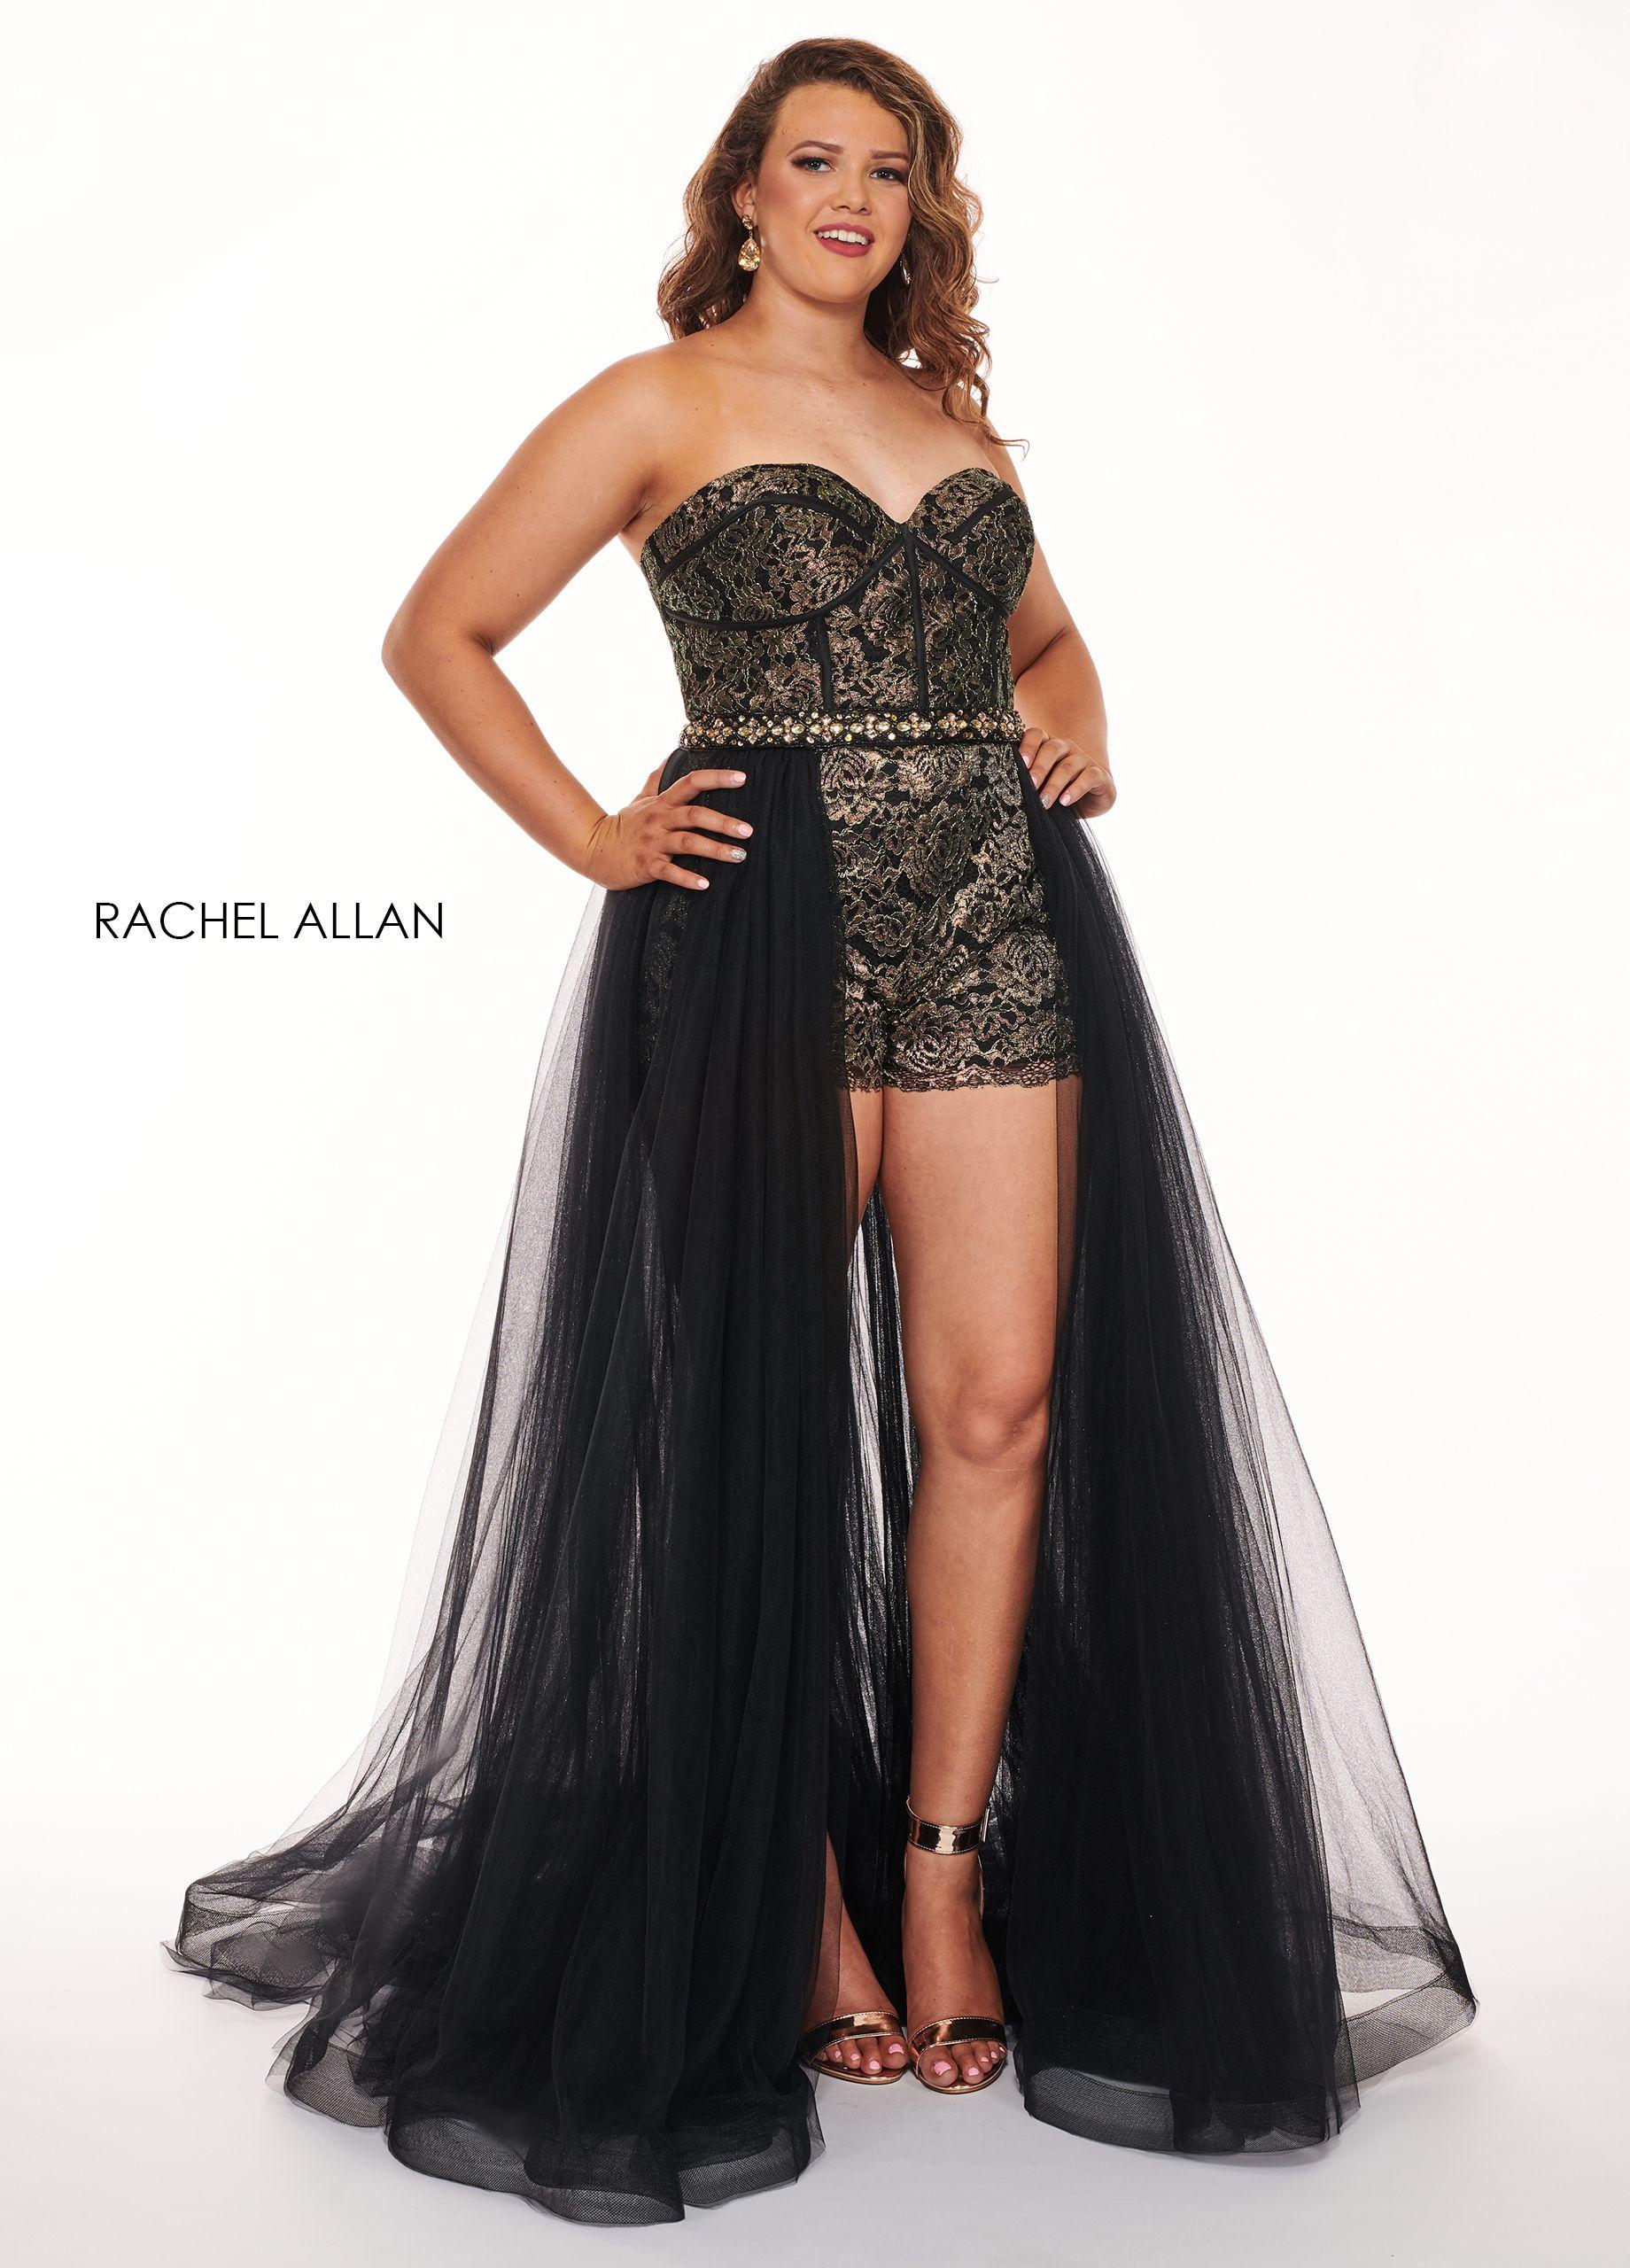 136334daa991 Prom dress 2019 | Rachel Allan Curves Spring 2019 in 2019 | Prom ...